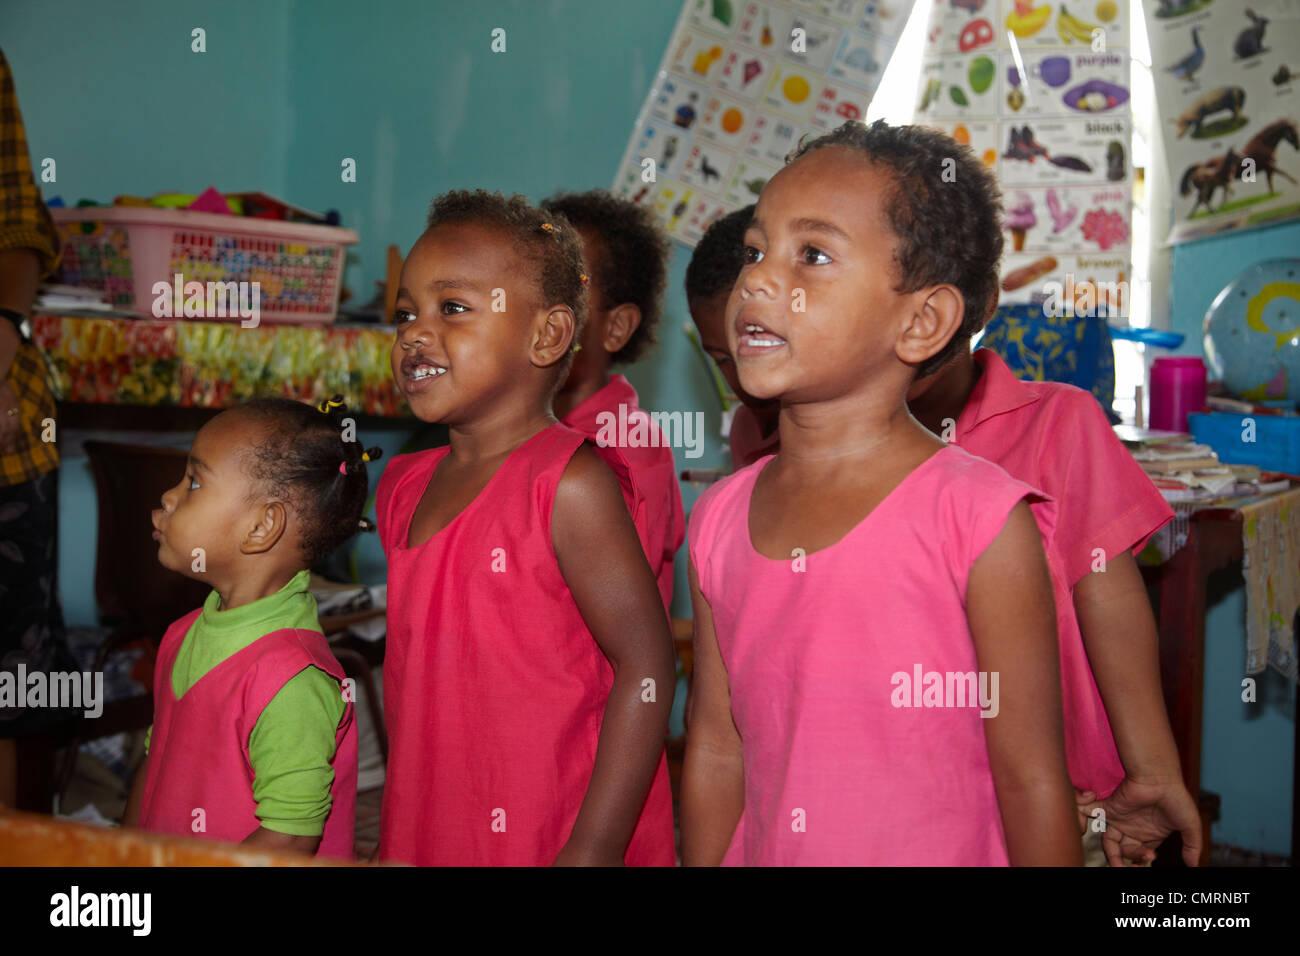 Class of preschool children, Namaqumaqua village, Coral Coast, Viti Levu, Fiji, South Pacific - Stock Image